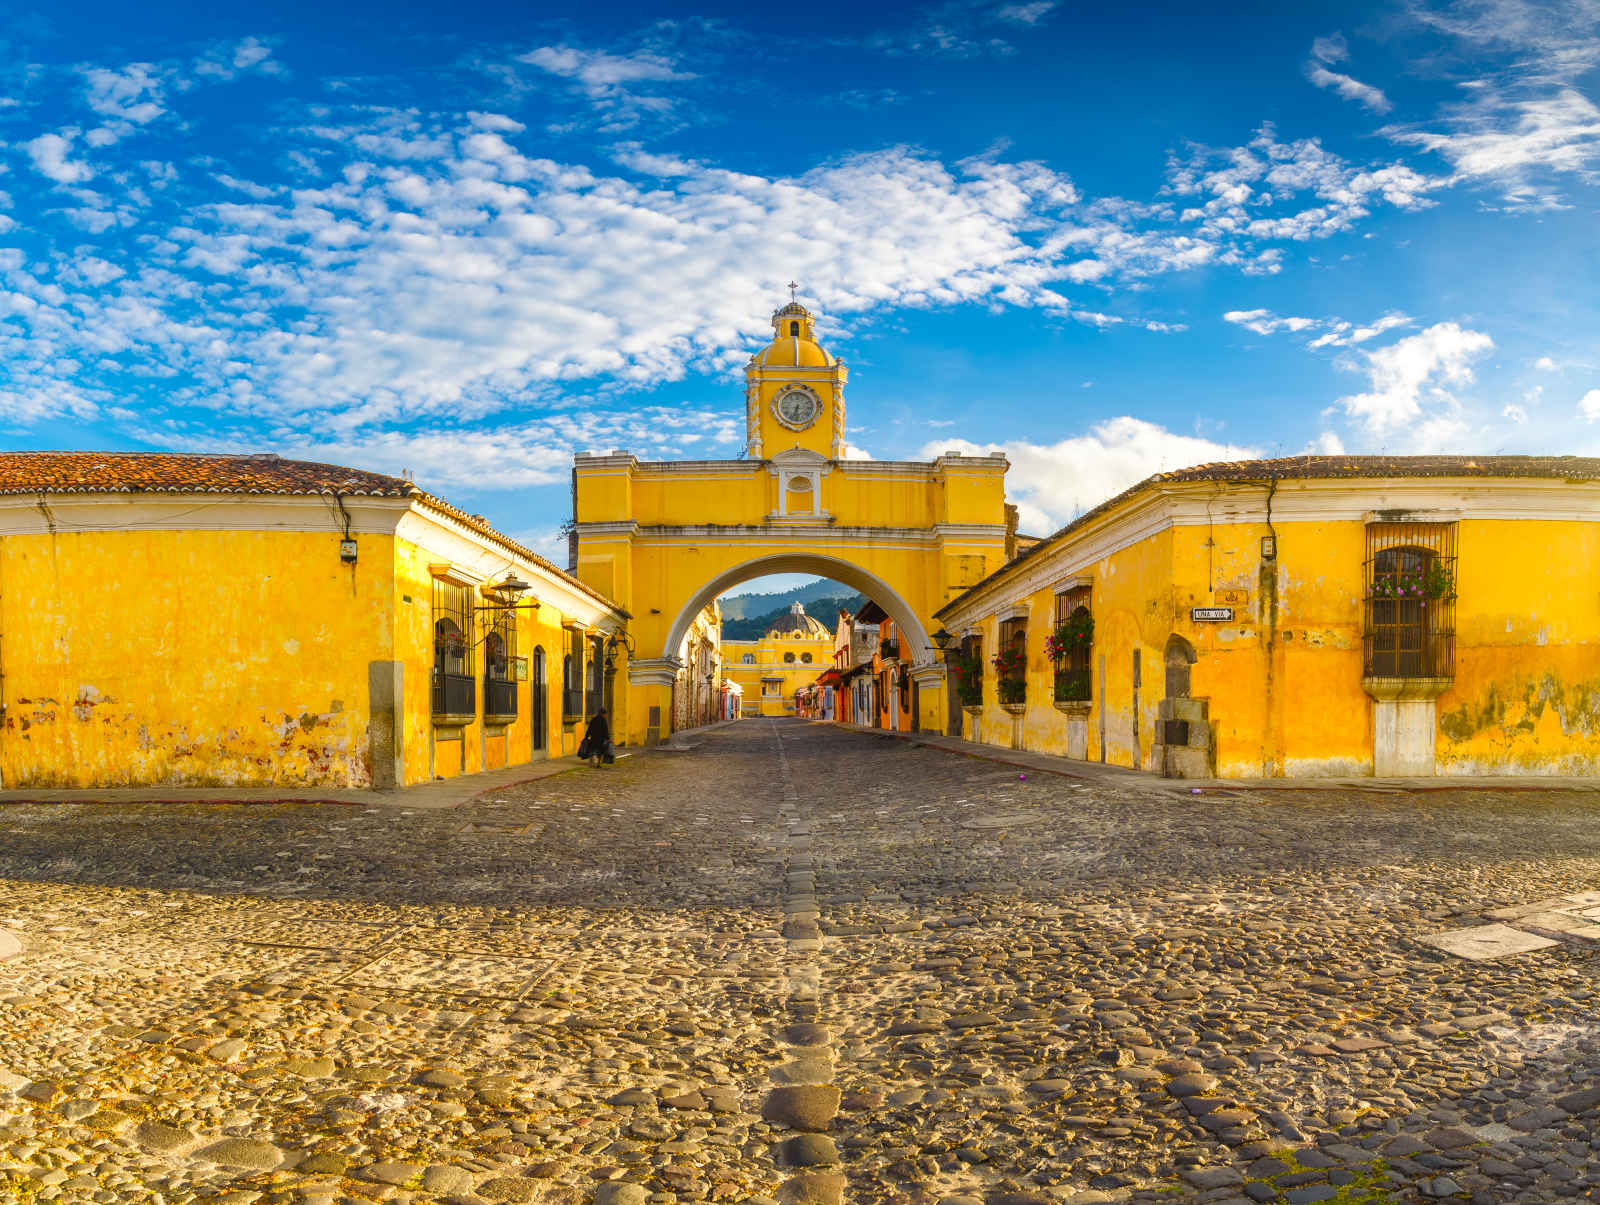 Guatemala - Honduras - Circuit Mayas d'Hier et d'Aujourd'hui